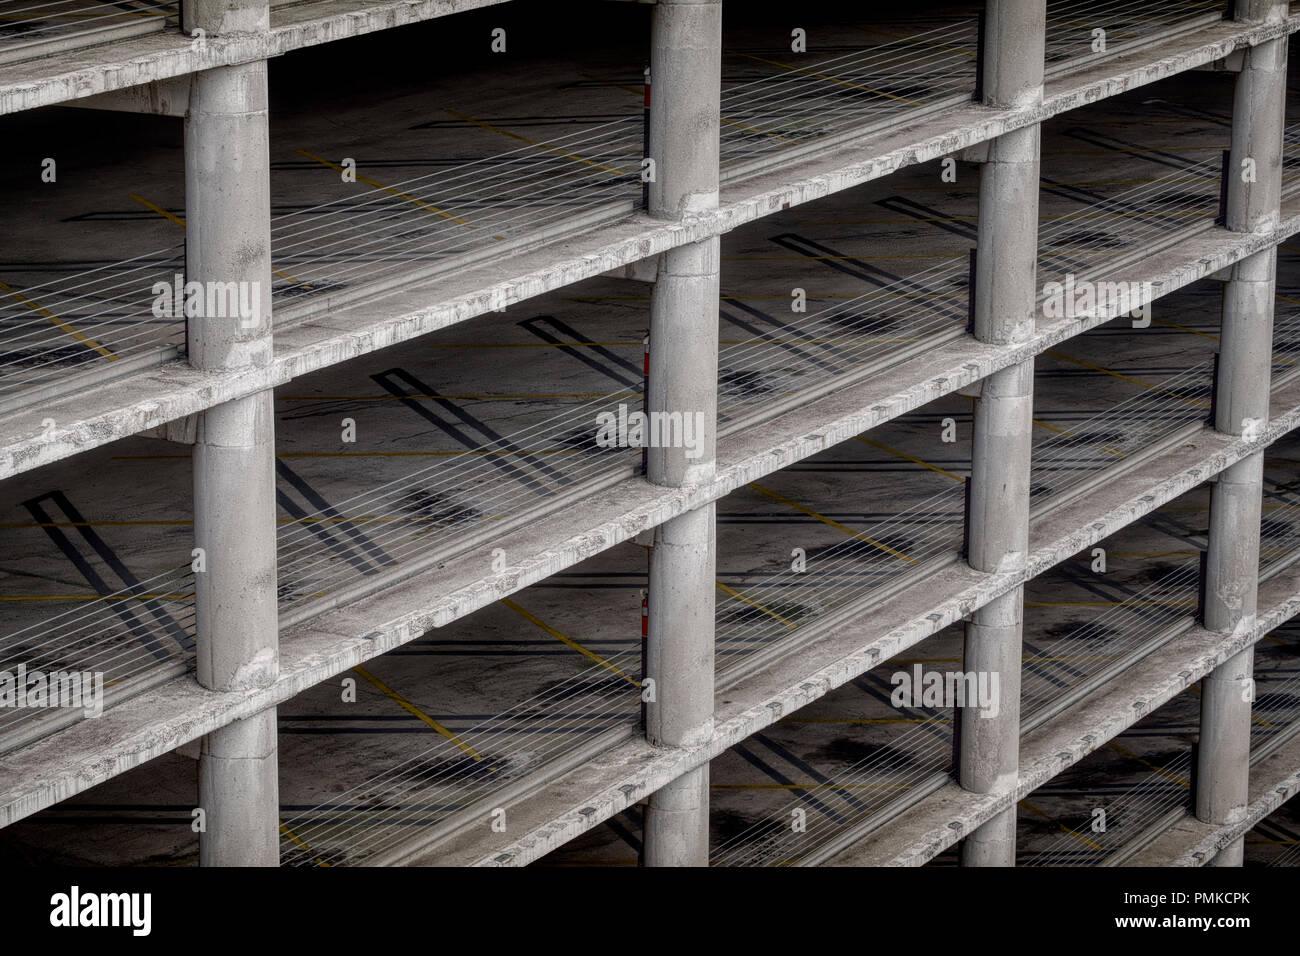 Multi-Storey carpark, Birmingham alabama - Stock Image